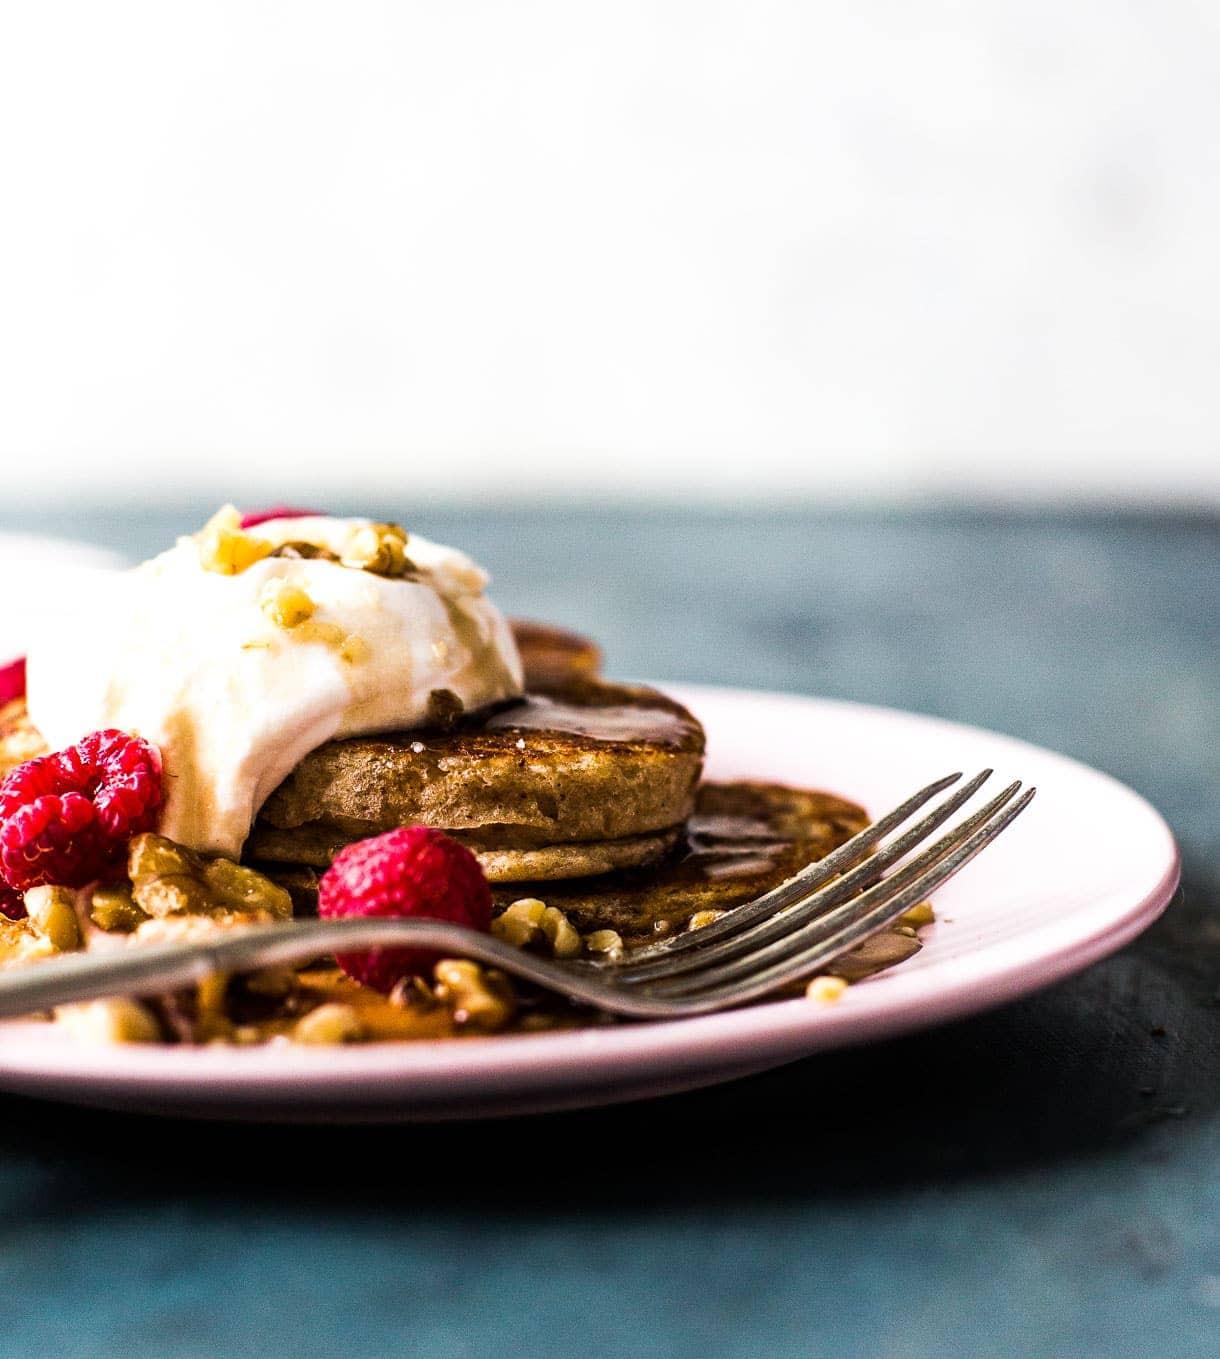 Homemade Gluten Free Pancake Recipe